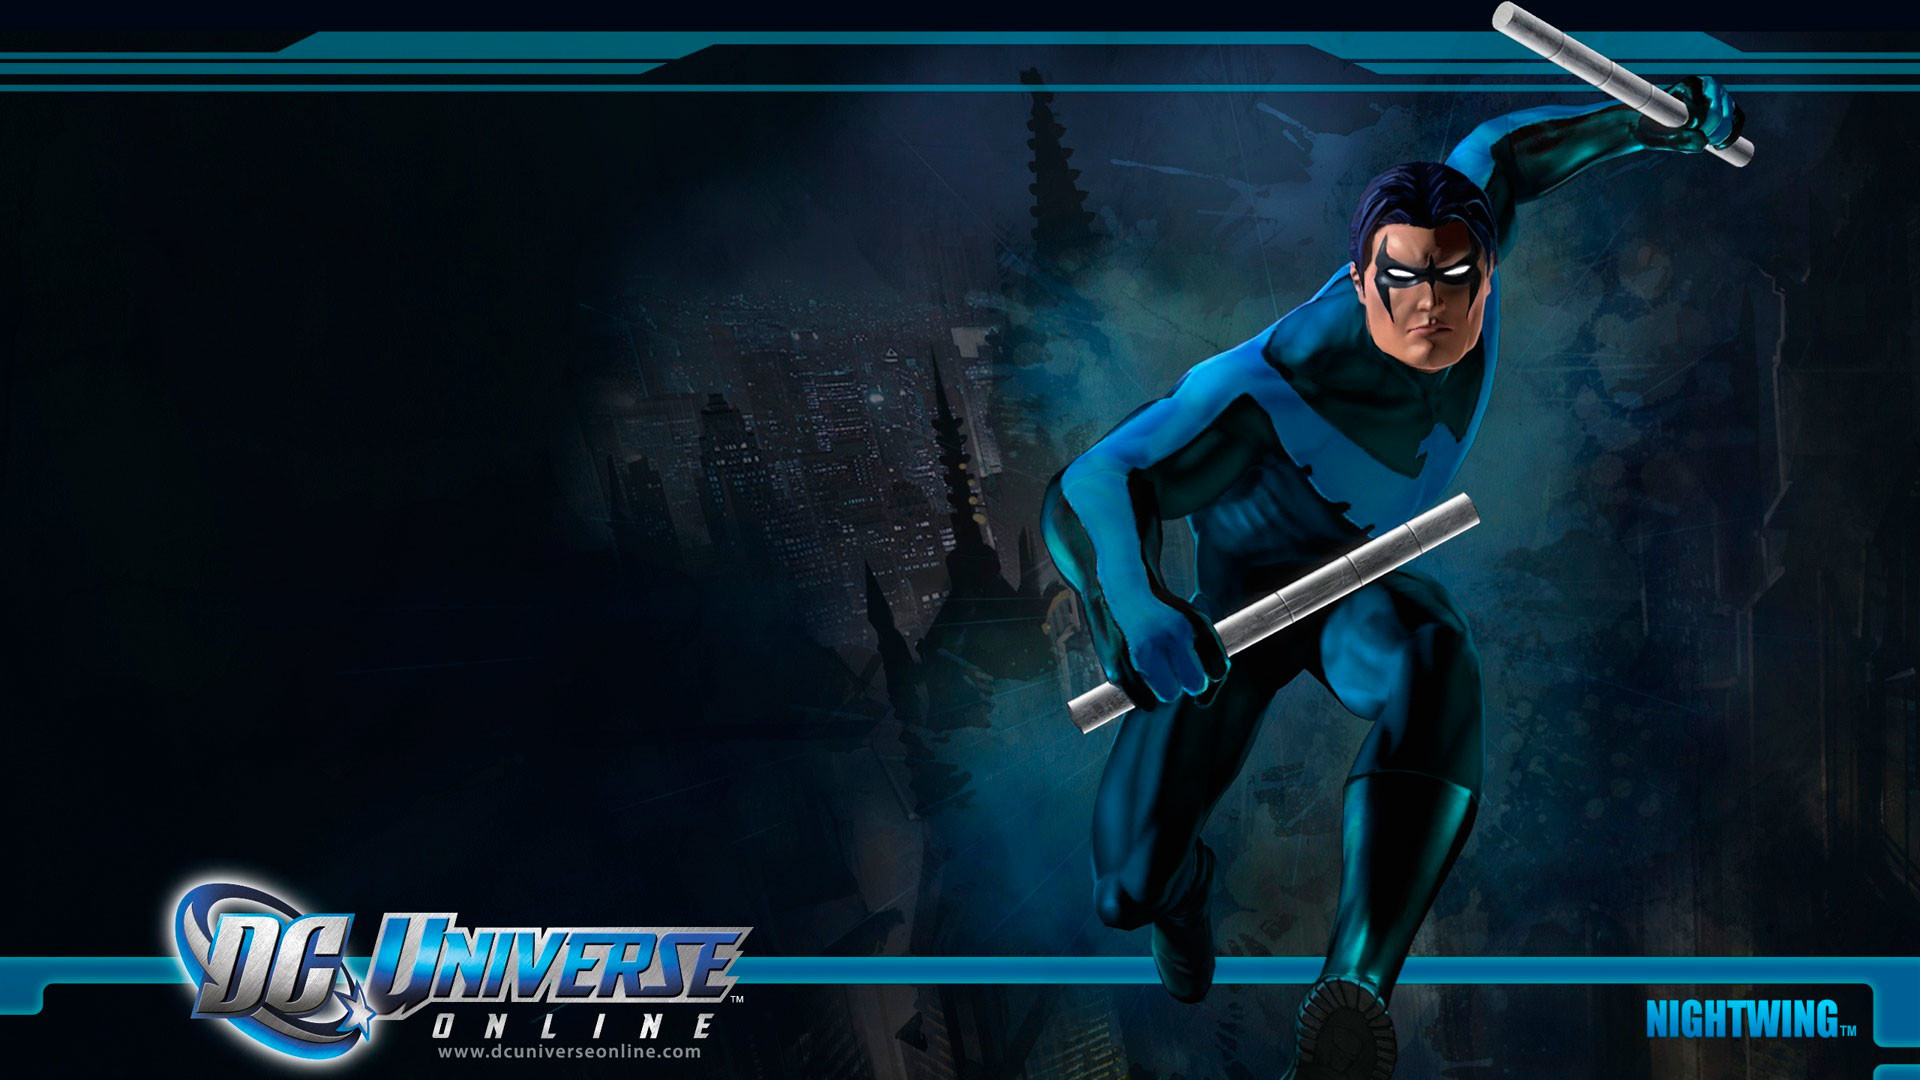 DC Universe Online 1080p Wallpaper …